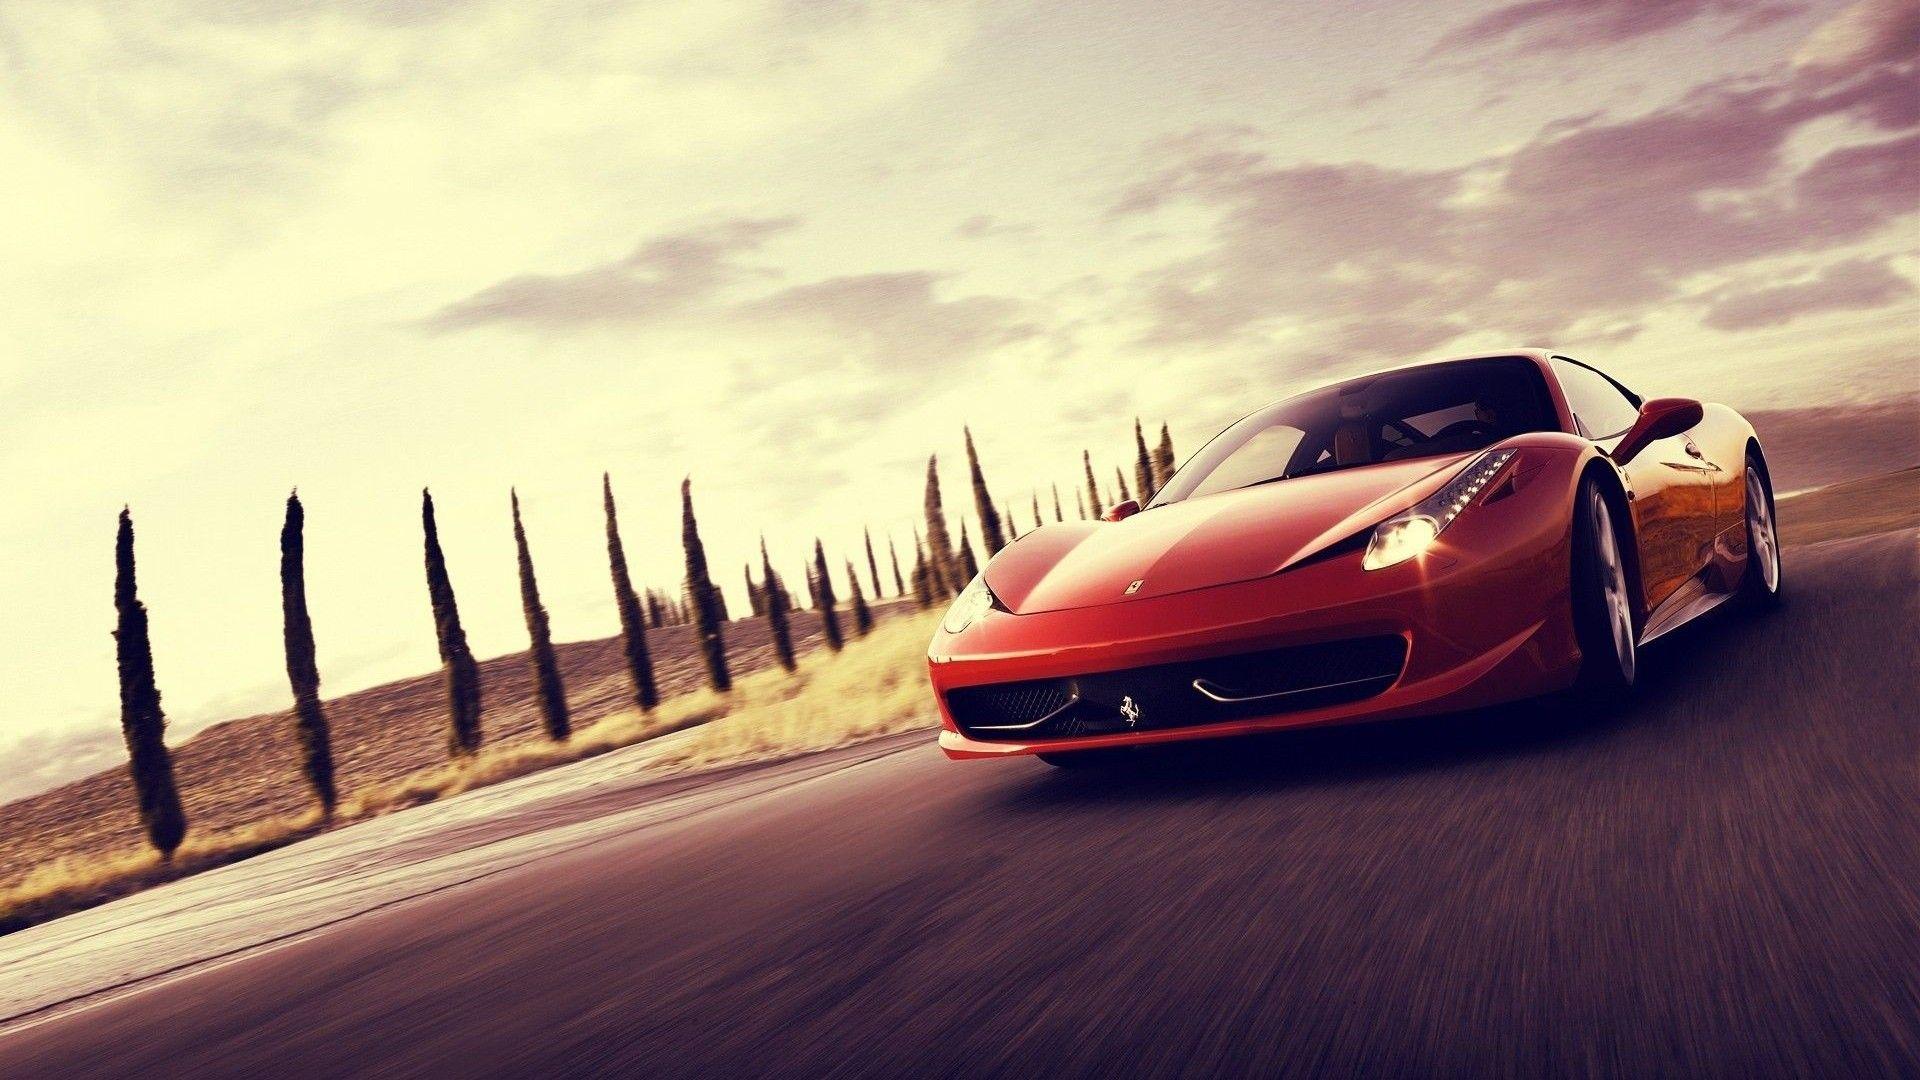 Car Desktop Backgrounds 2021 Live Wallpaper Hd Ferrari Italia Sports Car Wallpaper Car Wallpapers